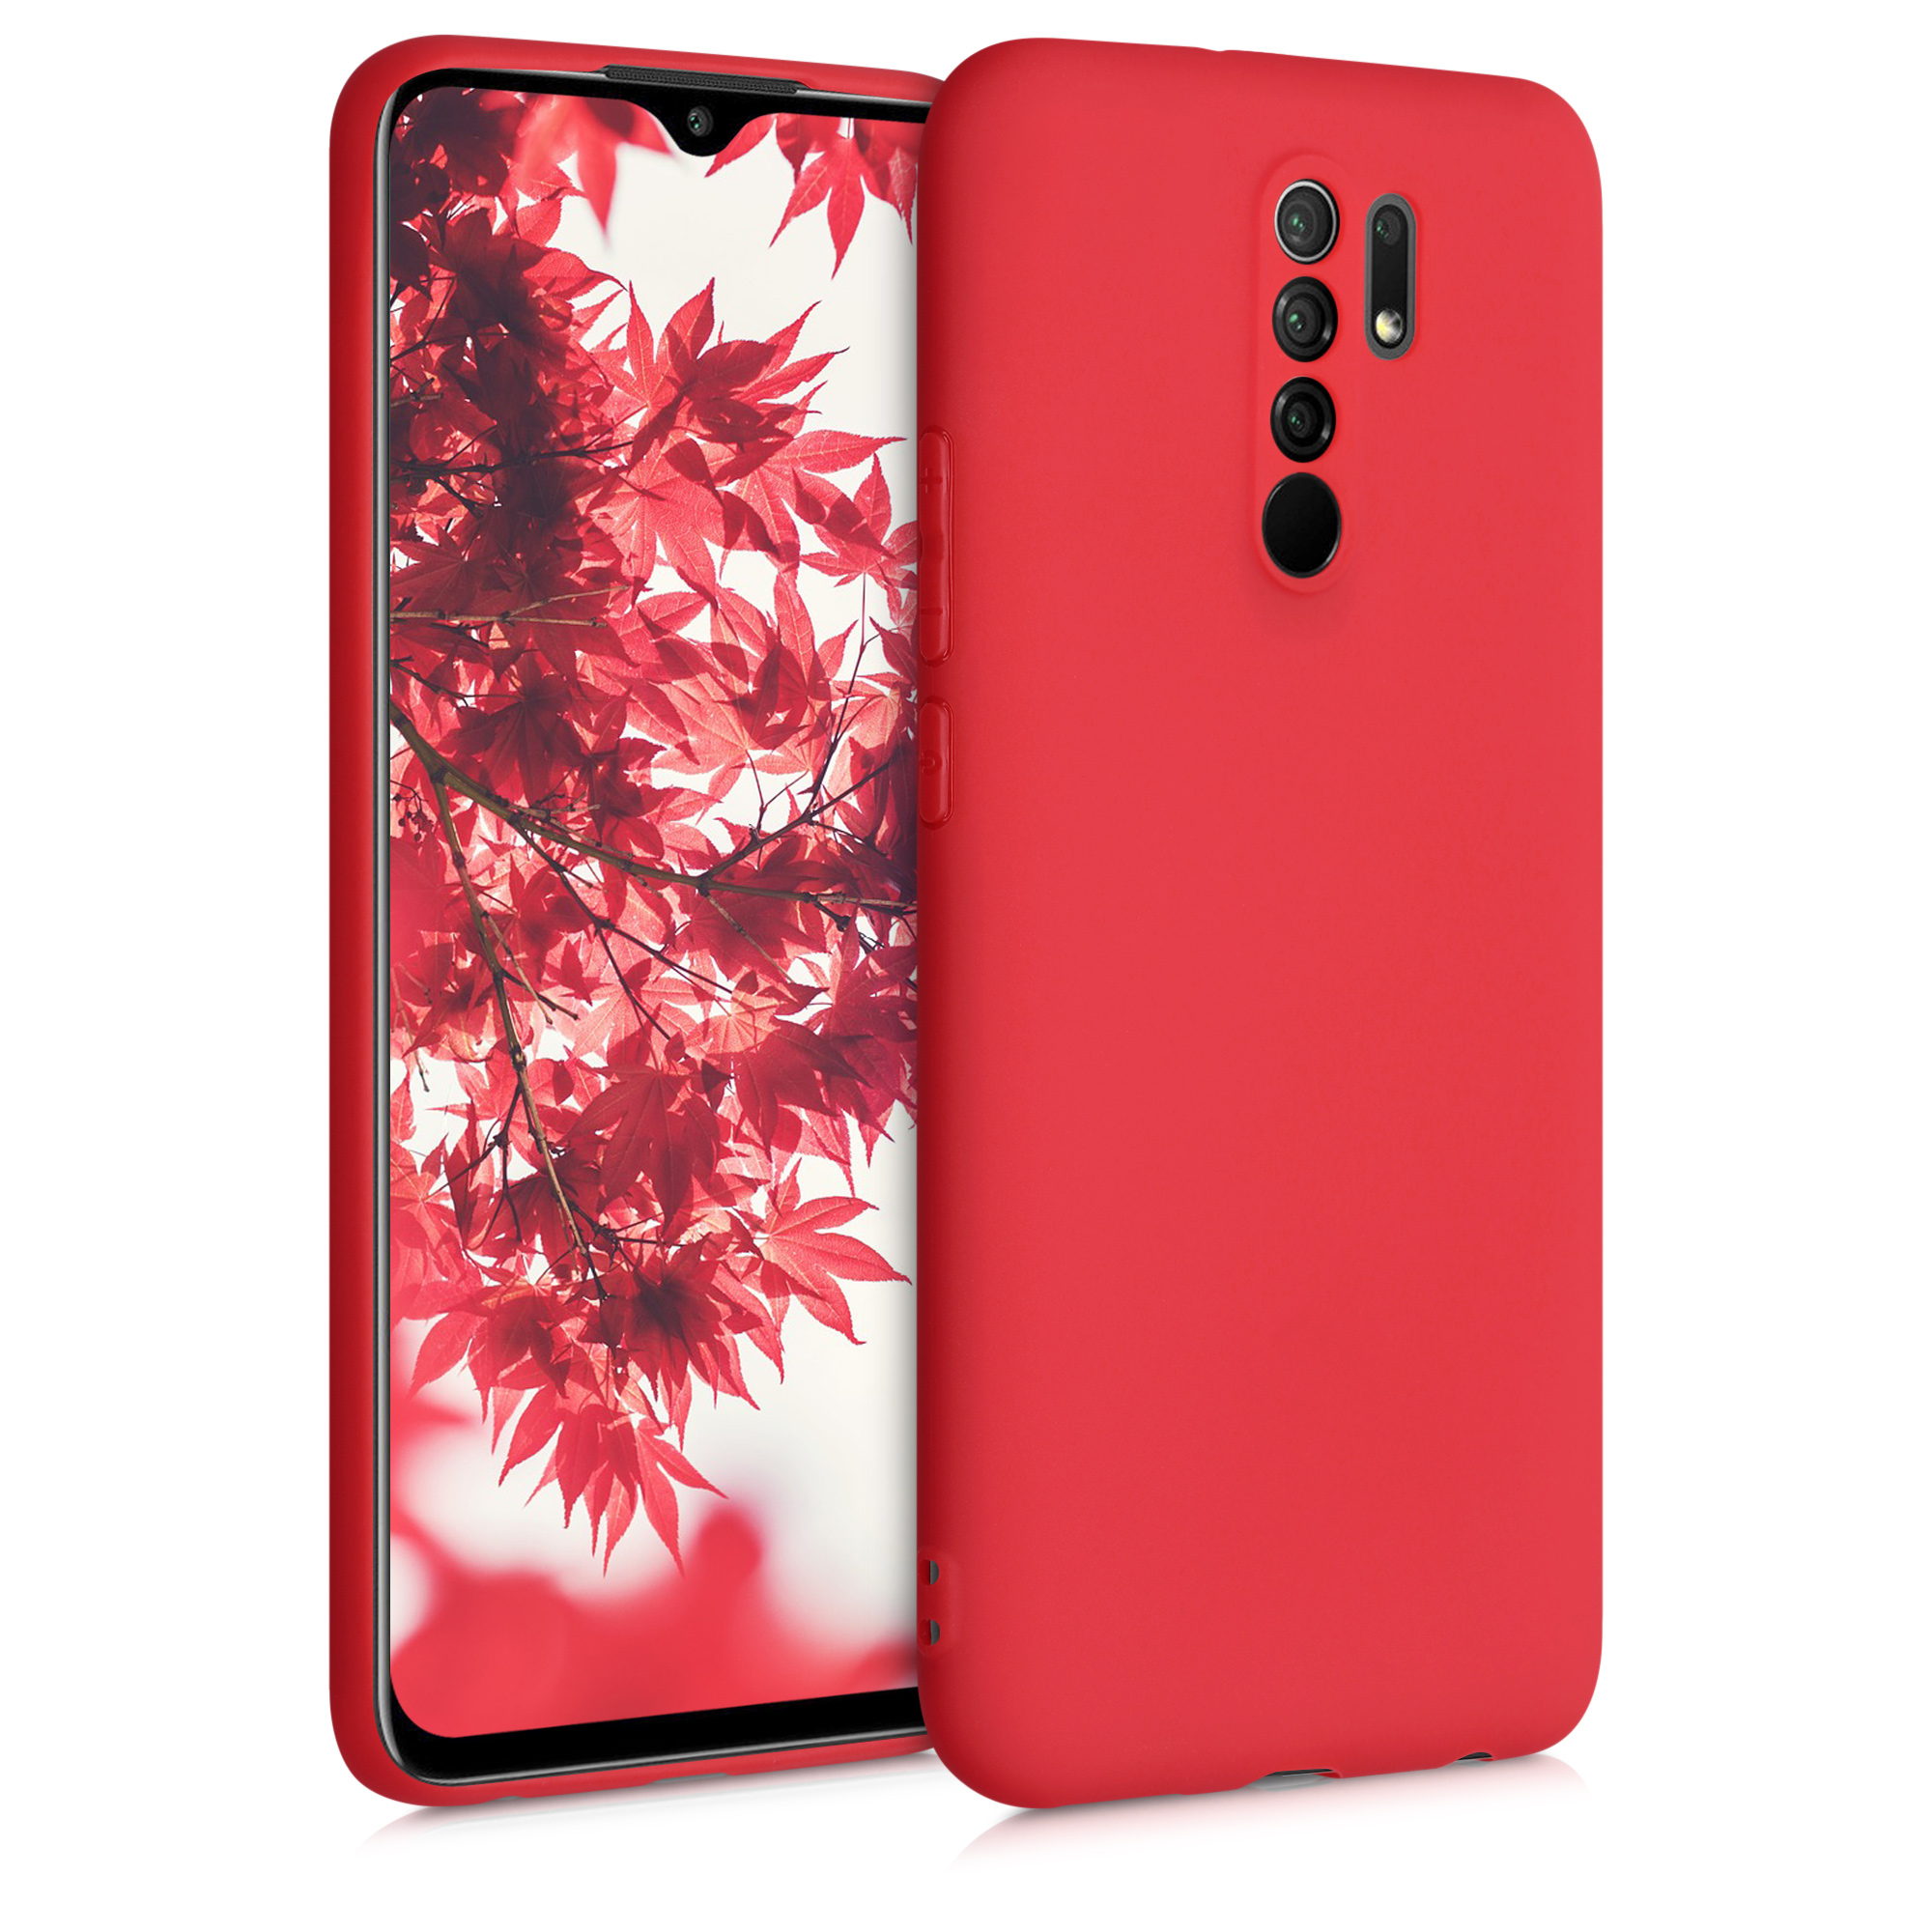 Kvalitní silikonové TPU pouzdro | obal pro Xiaomi Redmi 9 - červený matný